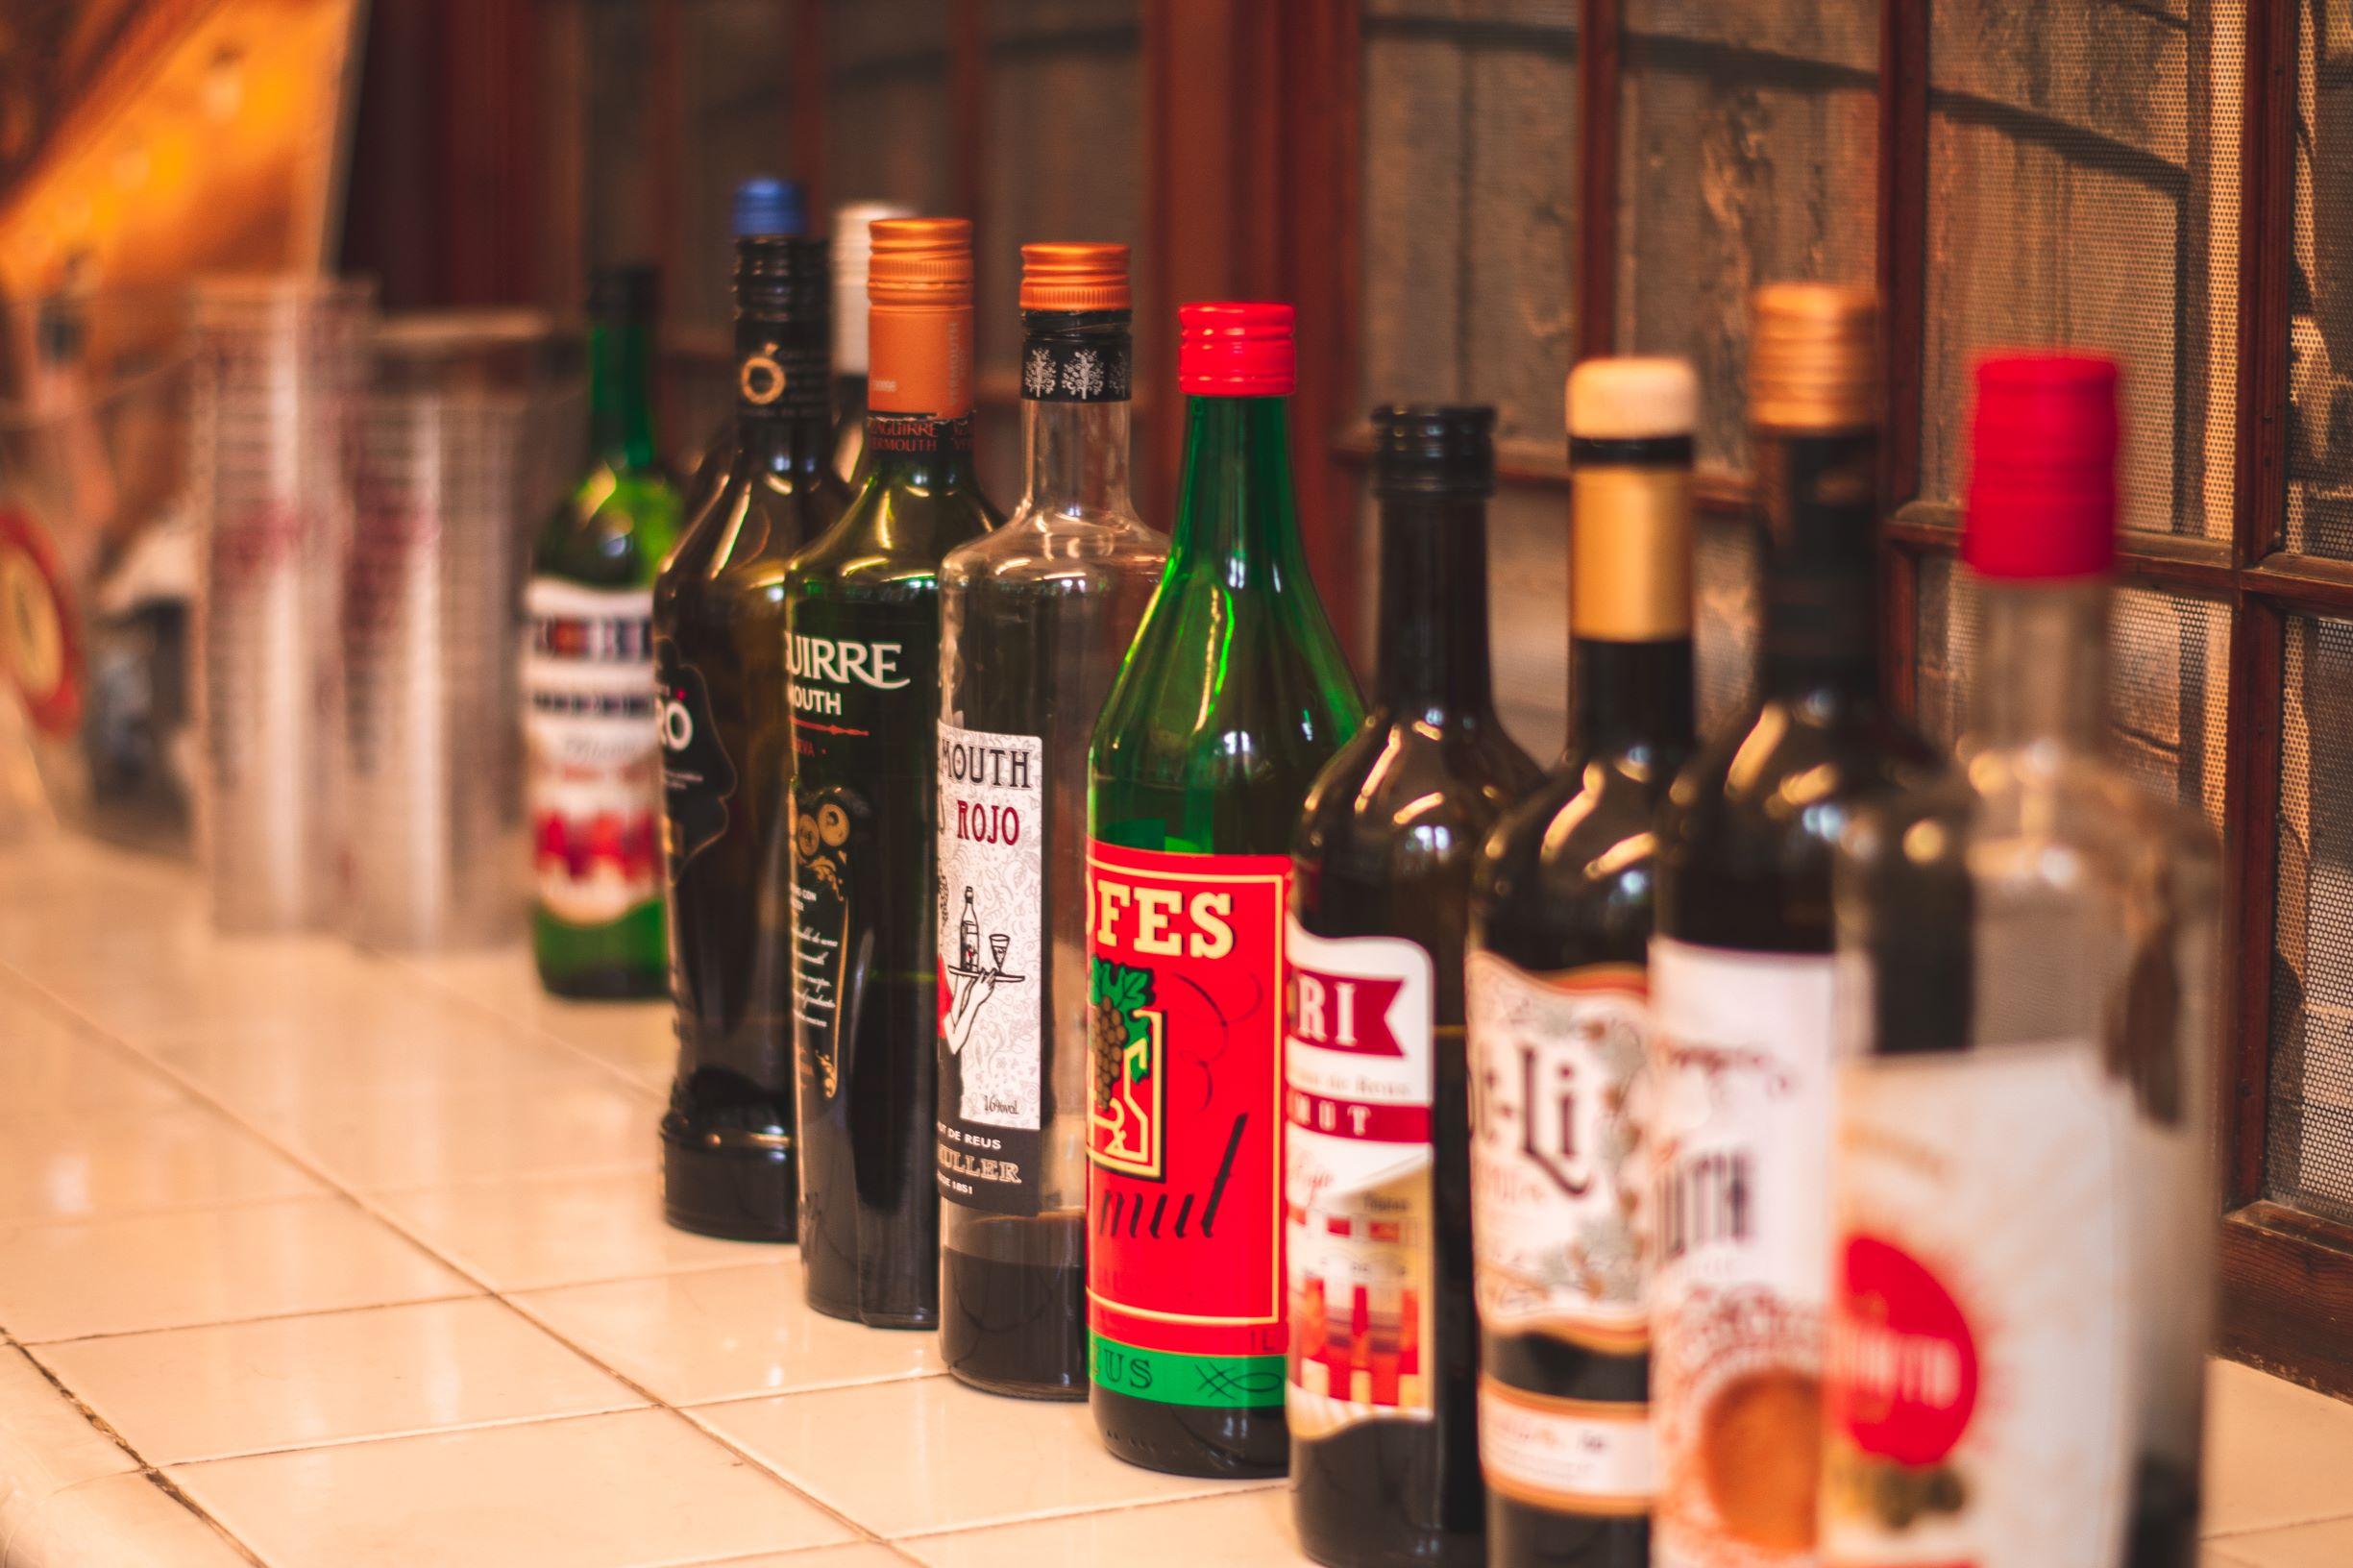 L2F Nov 19 pic Spain vermouth Reus Estacio Enologica bottles